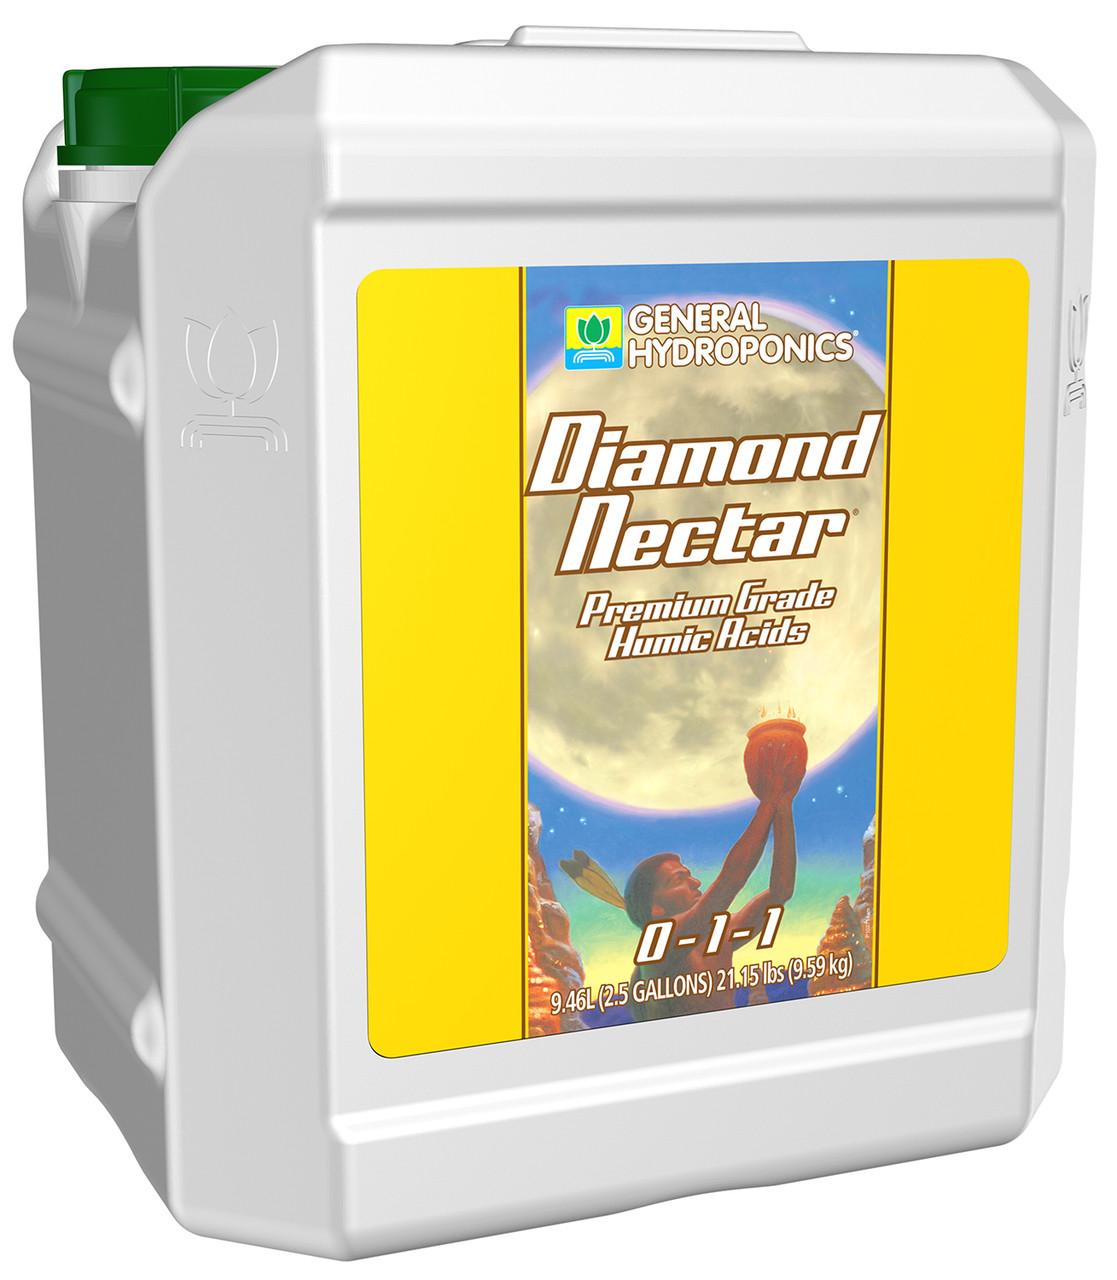 Premium nutrient transporter - Diamond Nectar General Hydroponics 10L